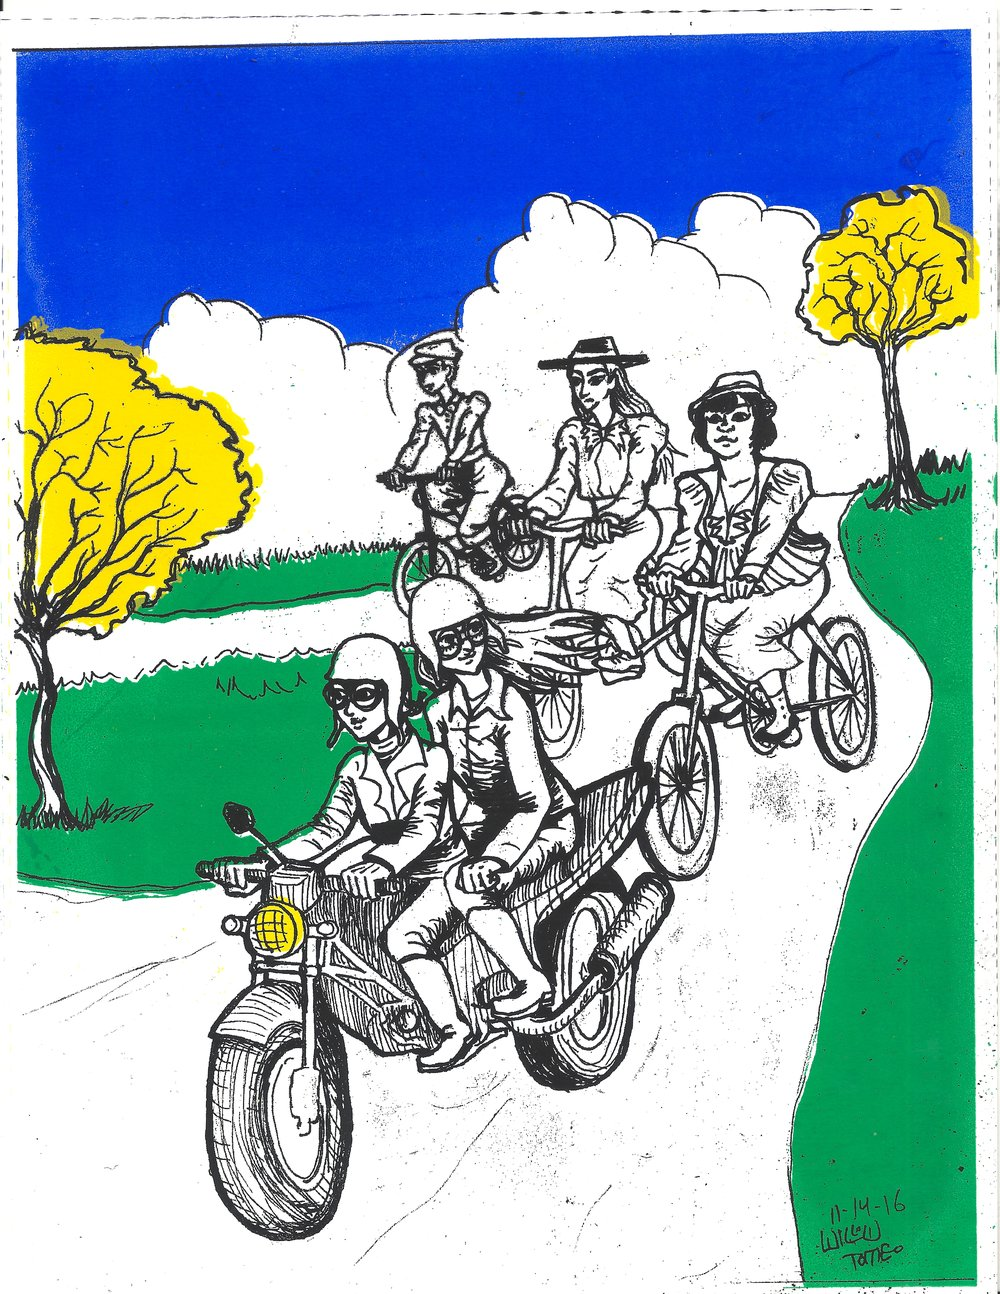 bikerace.jpeg